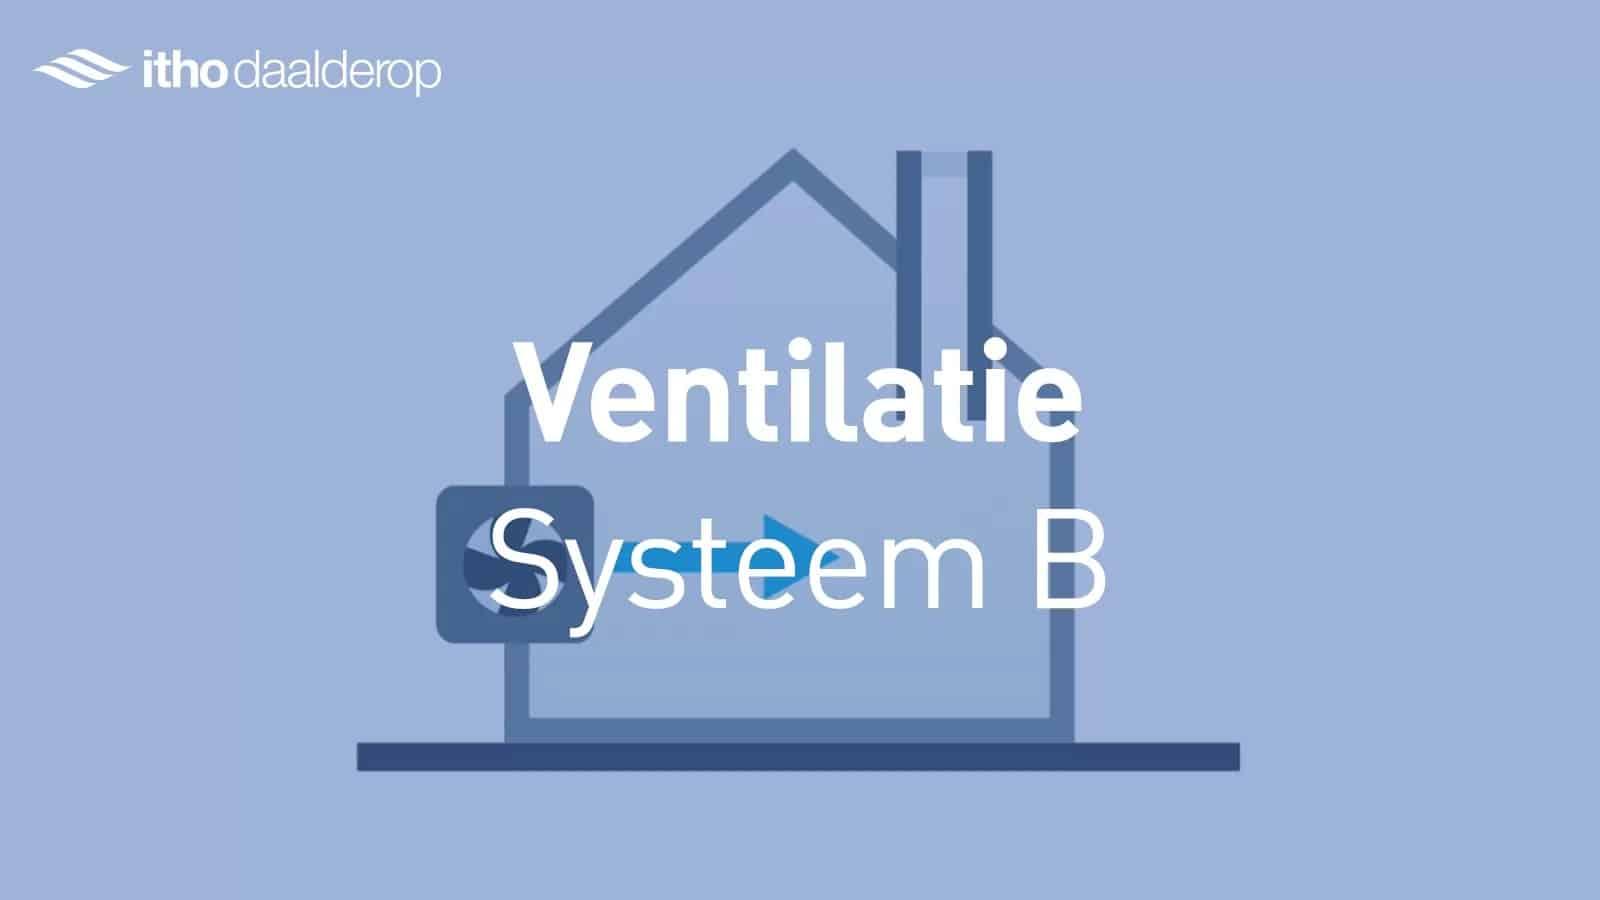 Ventilatiesysteem B